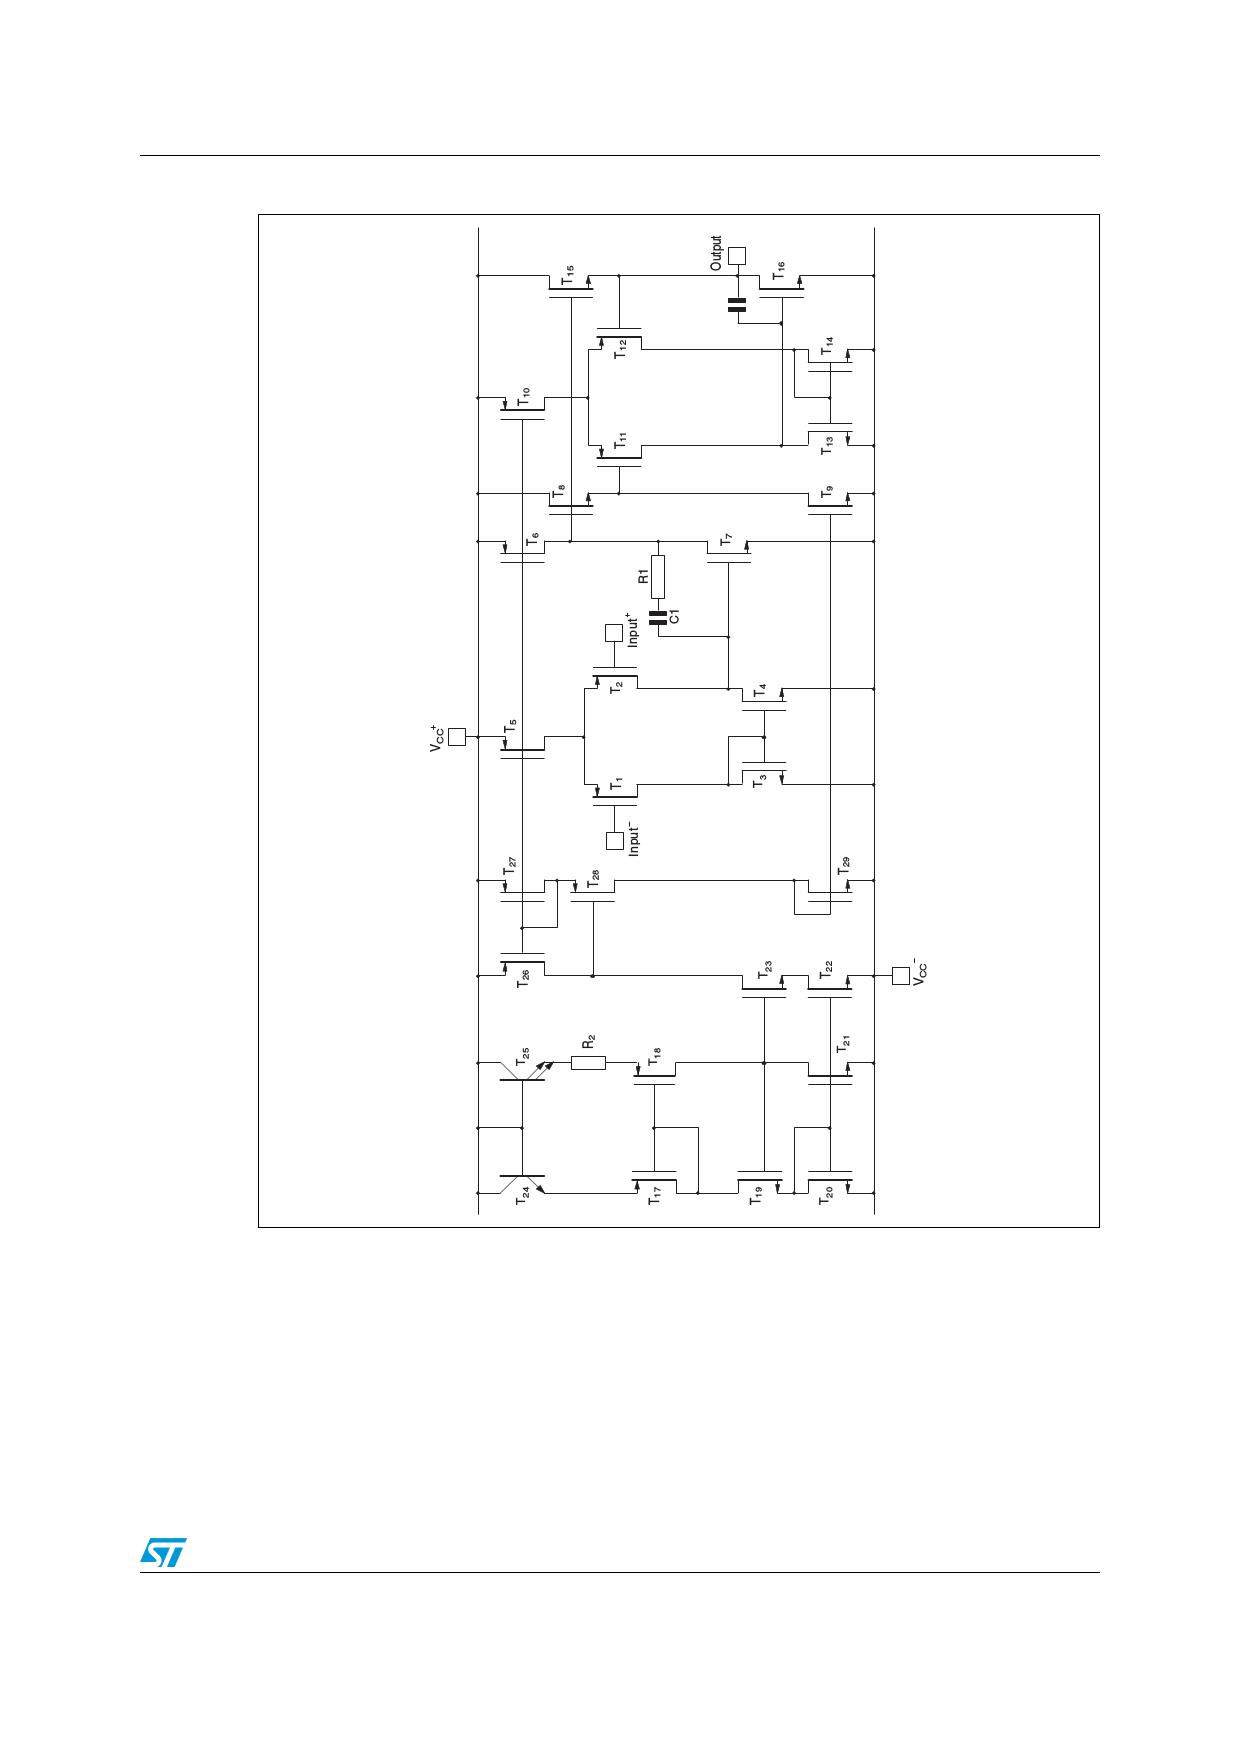 TS27M2B pdf, ピン配列